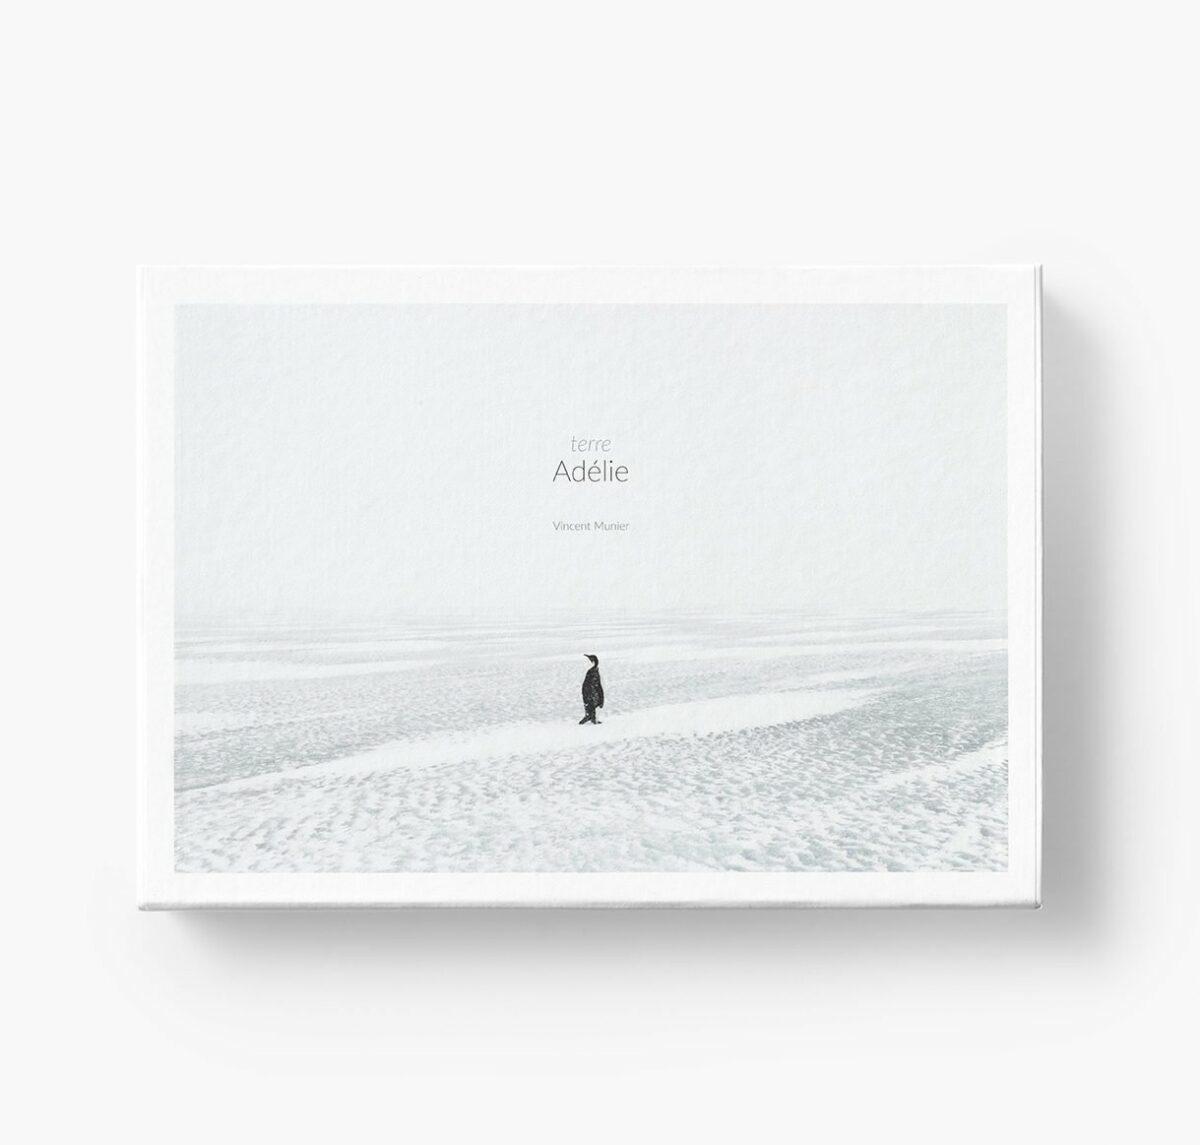 Livre_Adelie_VIncent-Munier_Laurent-Ballesta